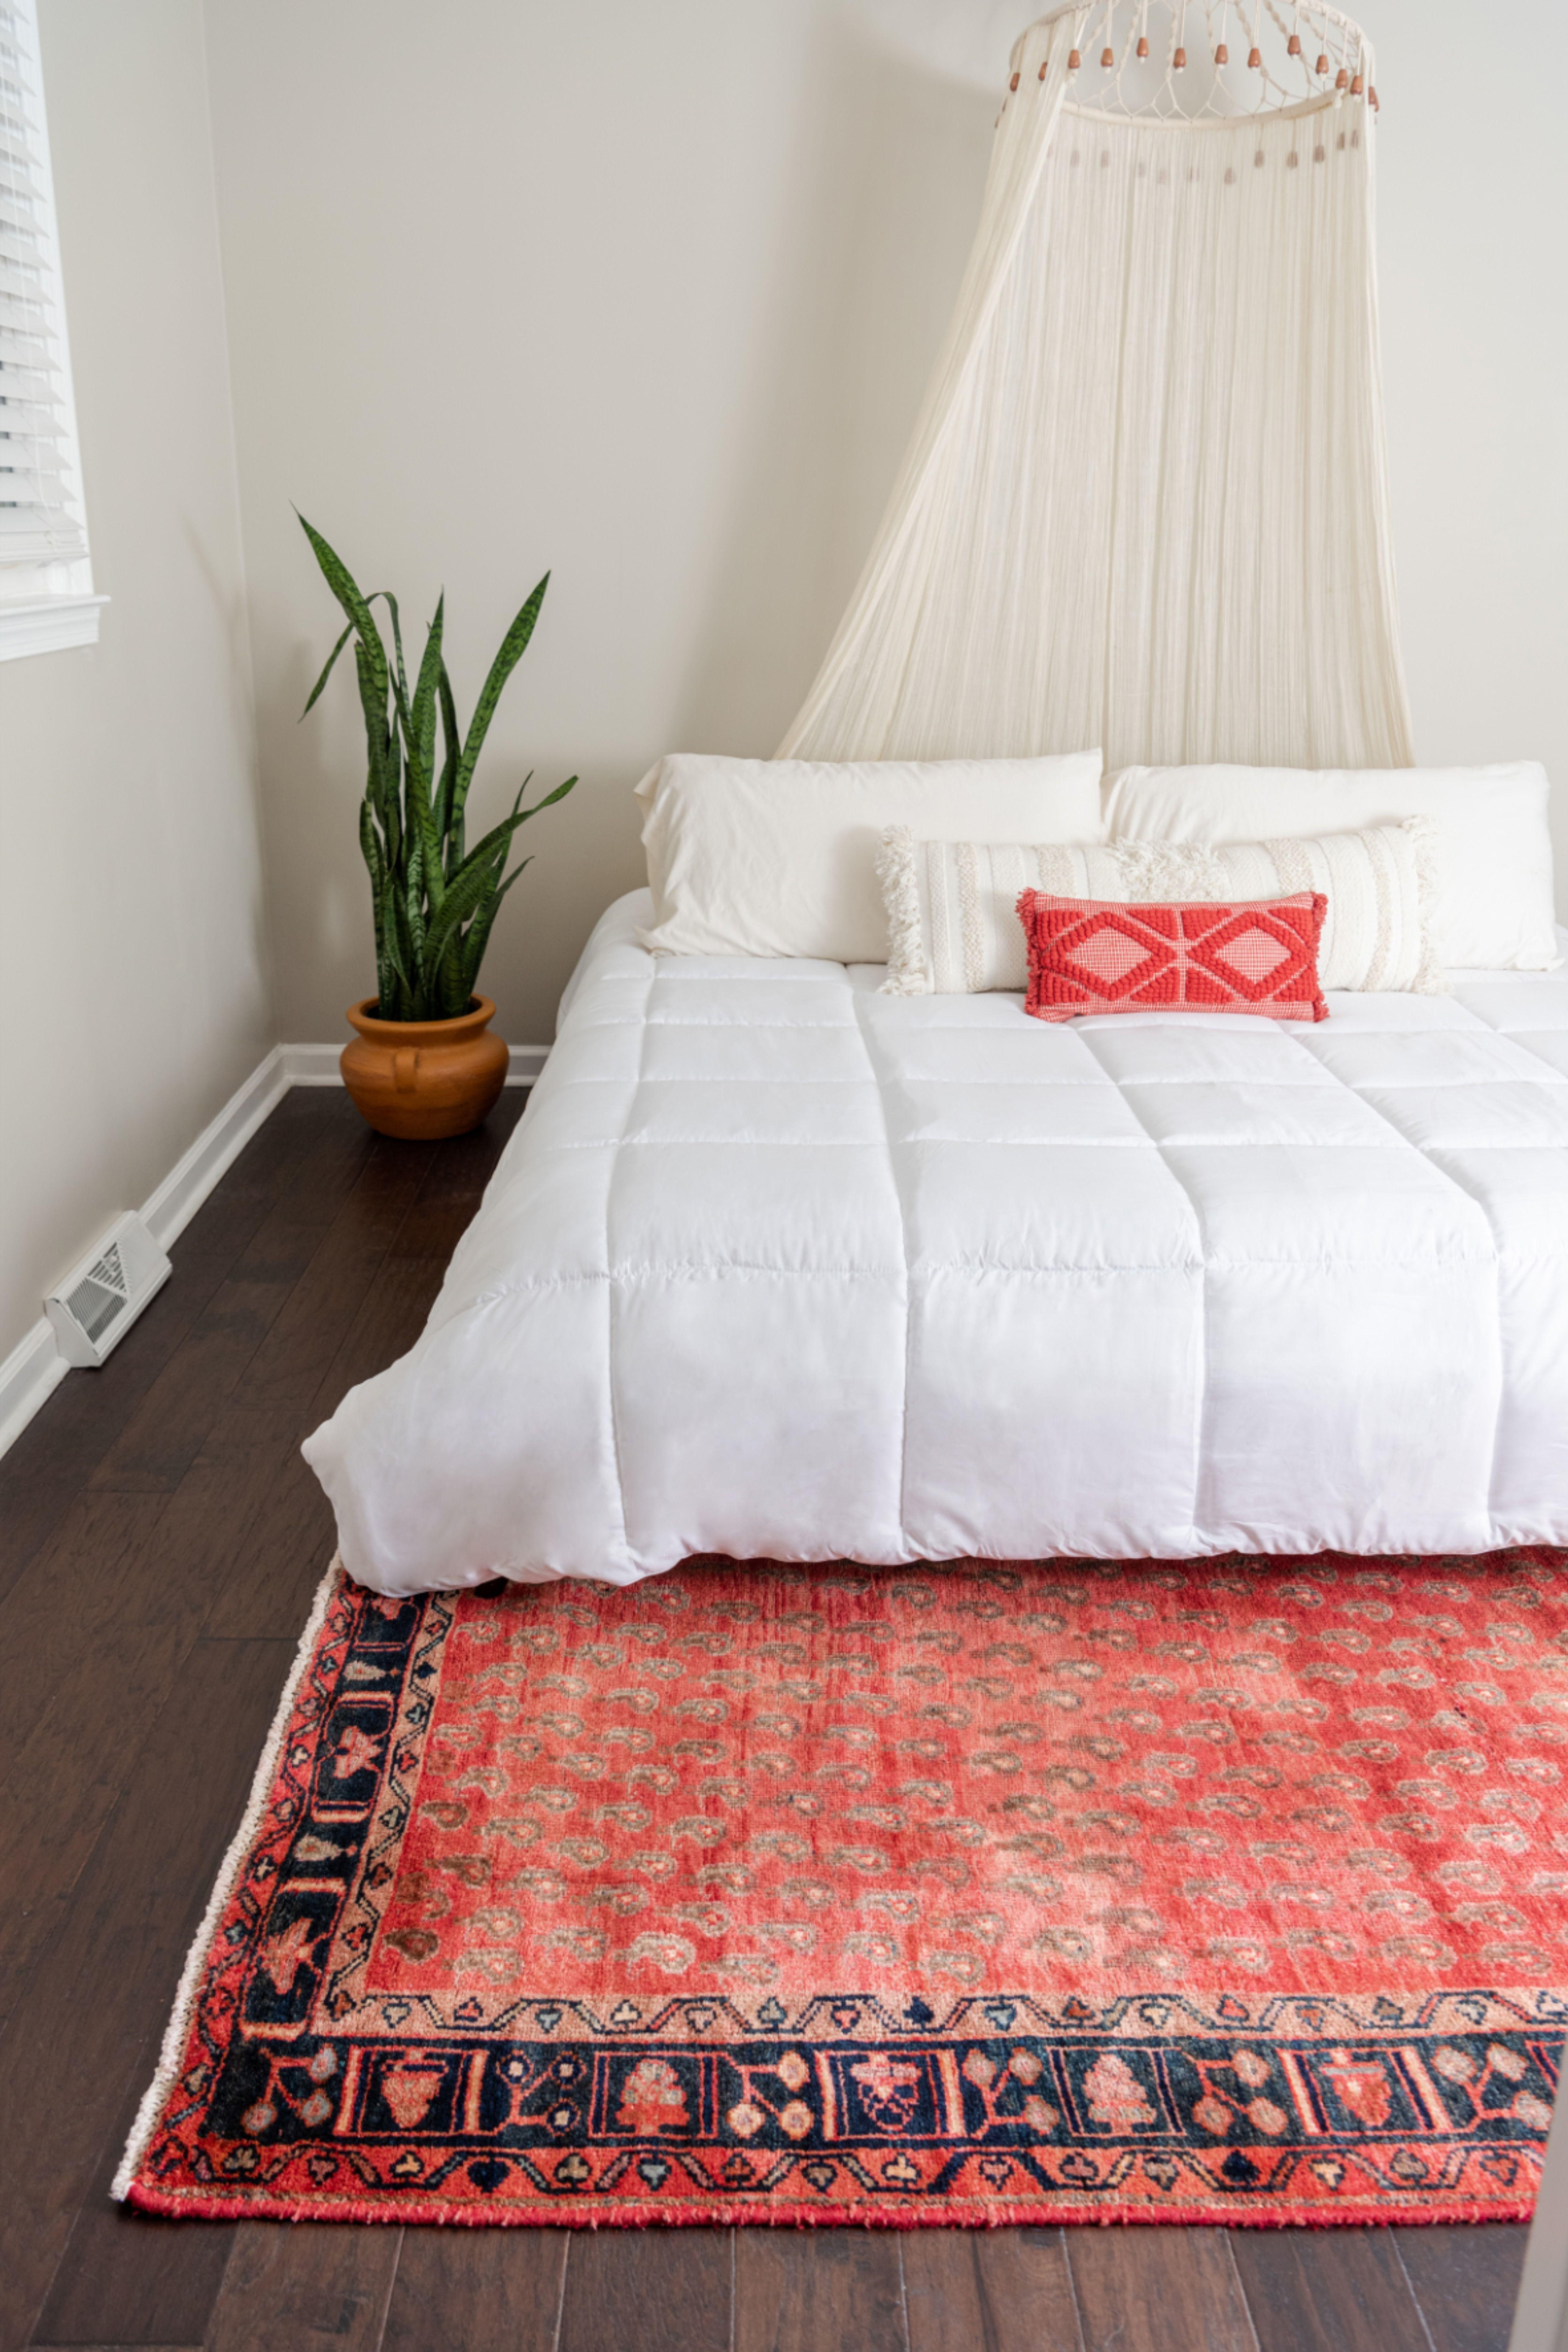 Earthy Bohemian Decor In 2020 Bohemian Interior Design Bedroom Bohemian Style Bedroom Furniture Bohemian Style Living Room